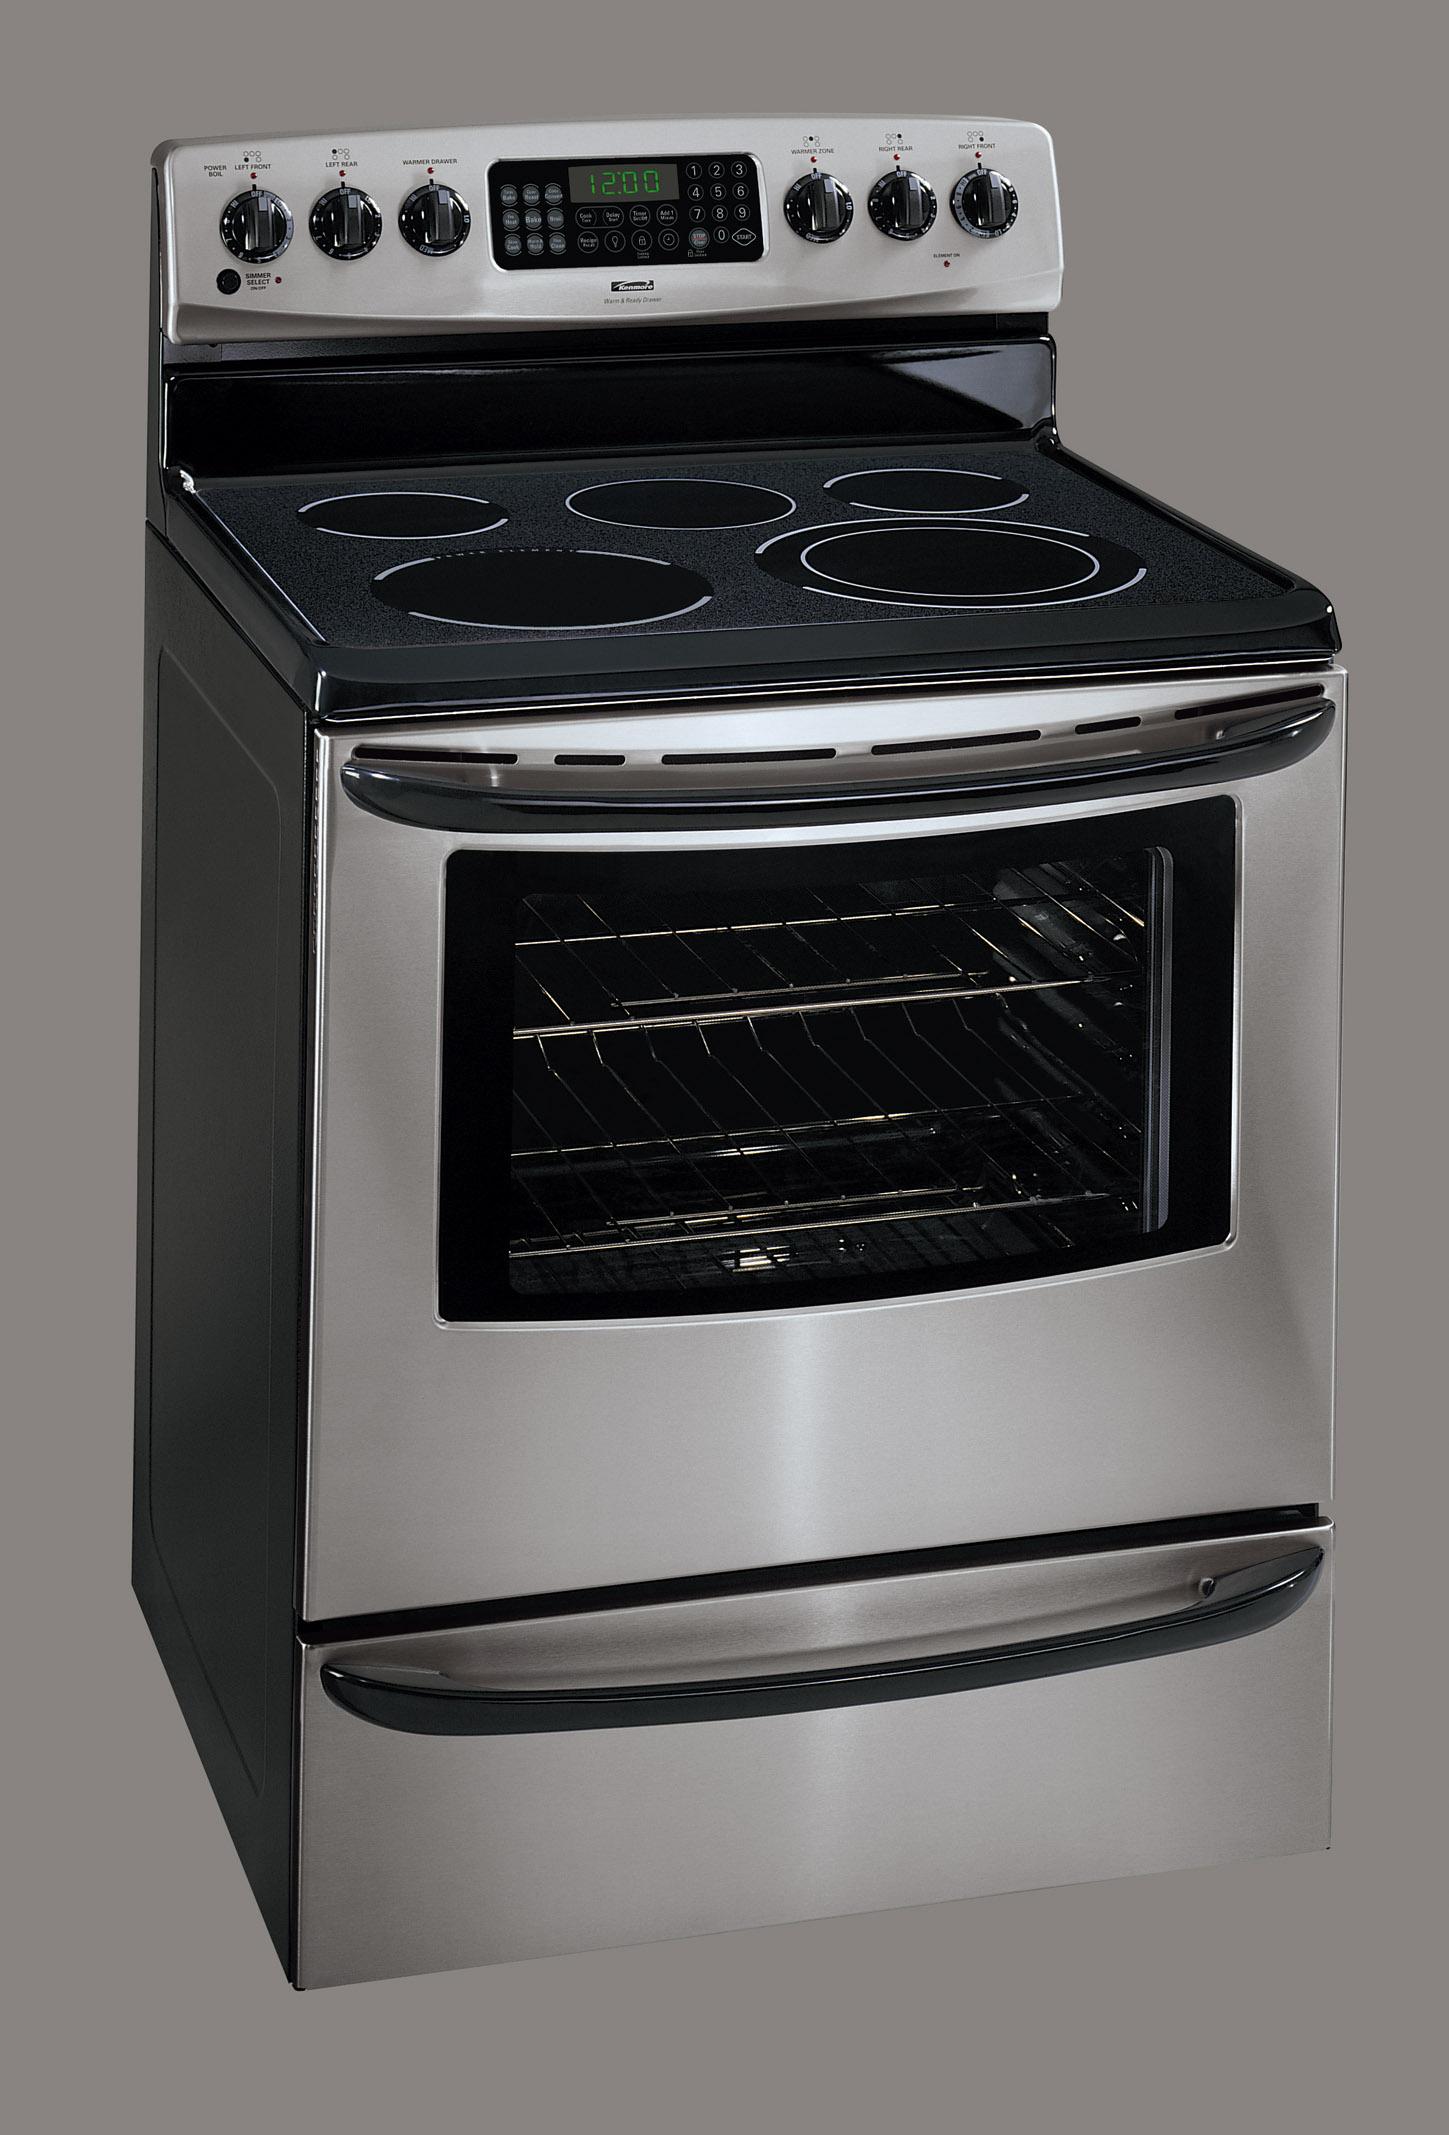 Kenmore Range/Stove/Oven Model 790.96613404 Parts